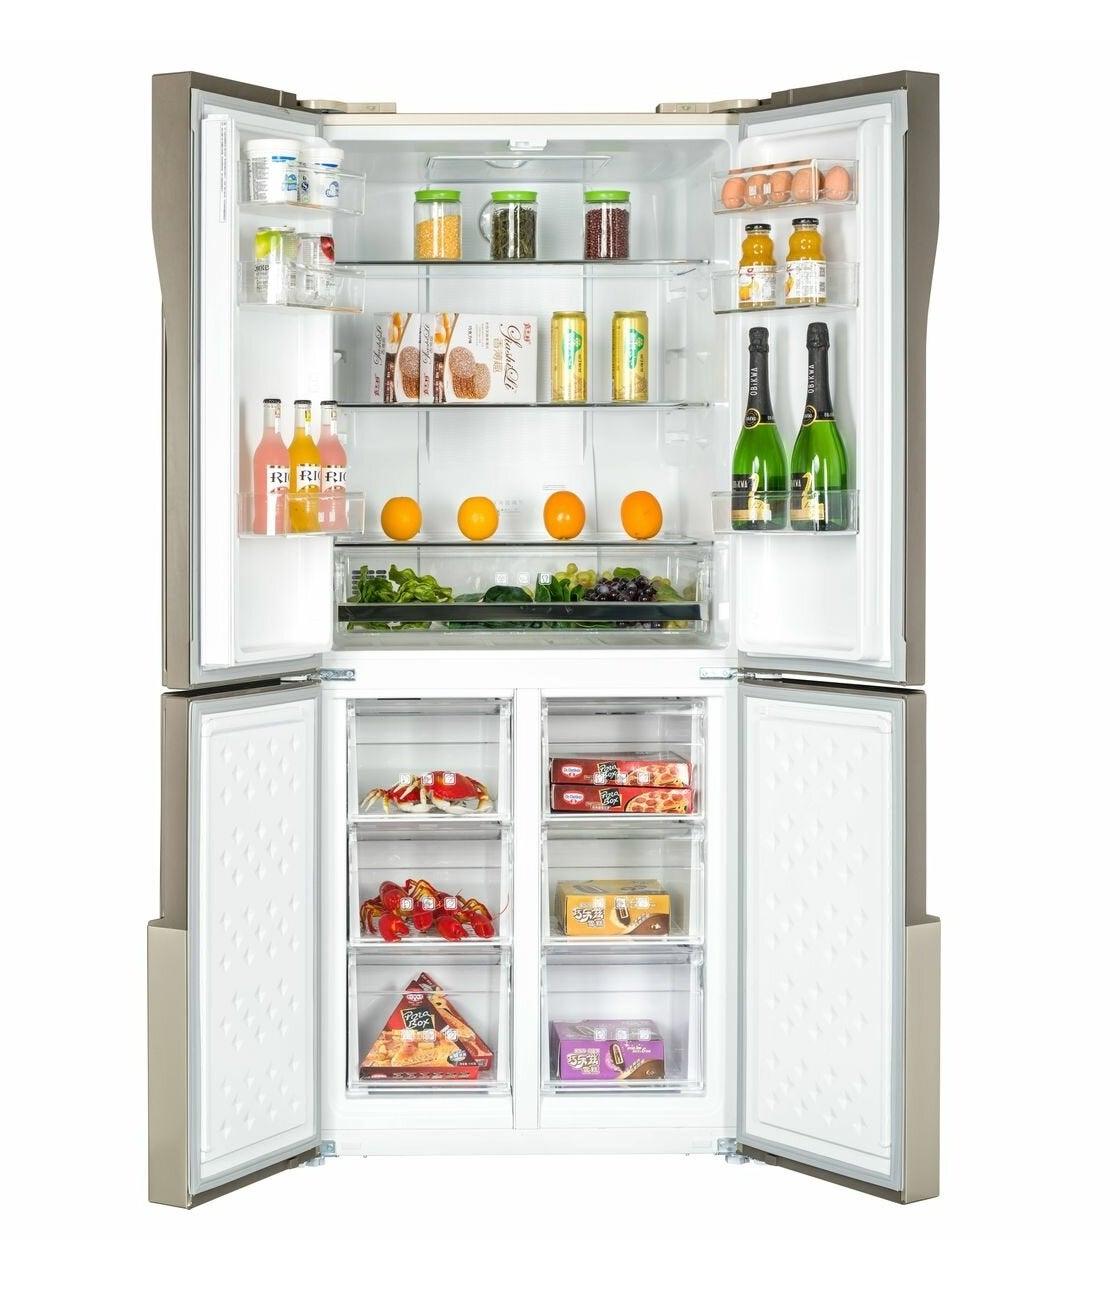 CHiQ CFD463WBG Refrigerator